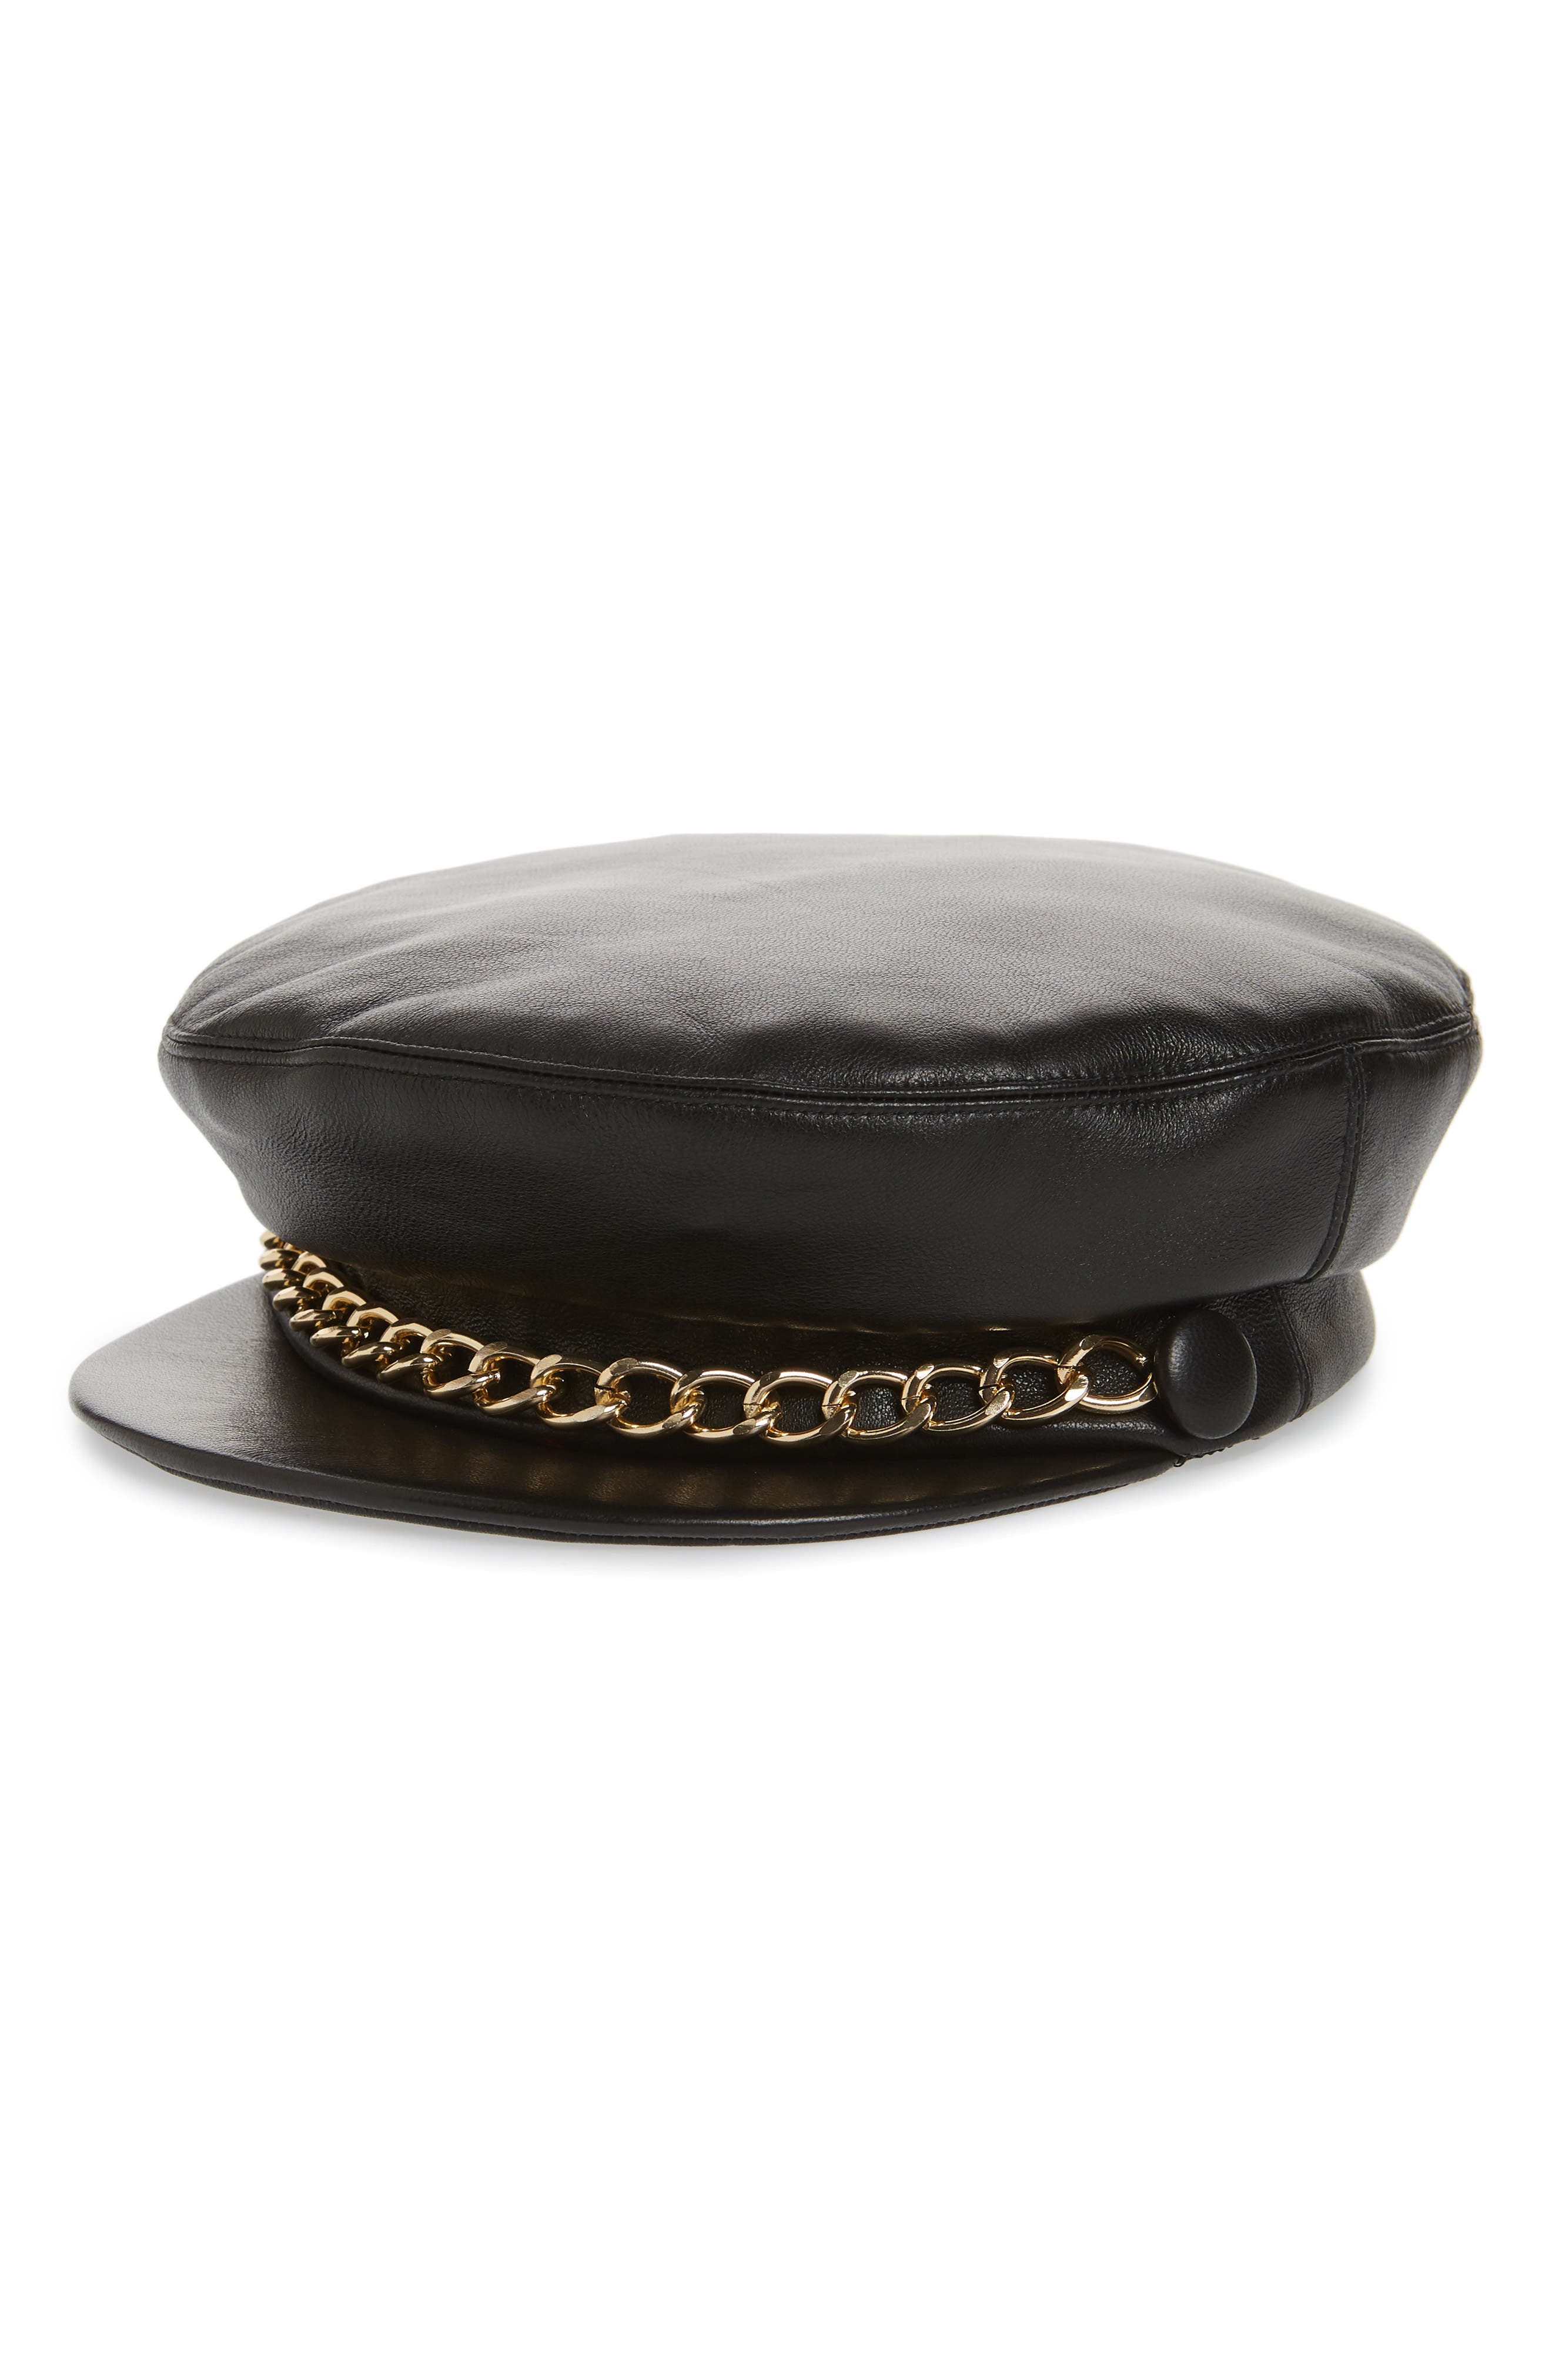 Marina Leather Baker Boy Cap,                             Main thumbnail 1, color,                             BLACK